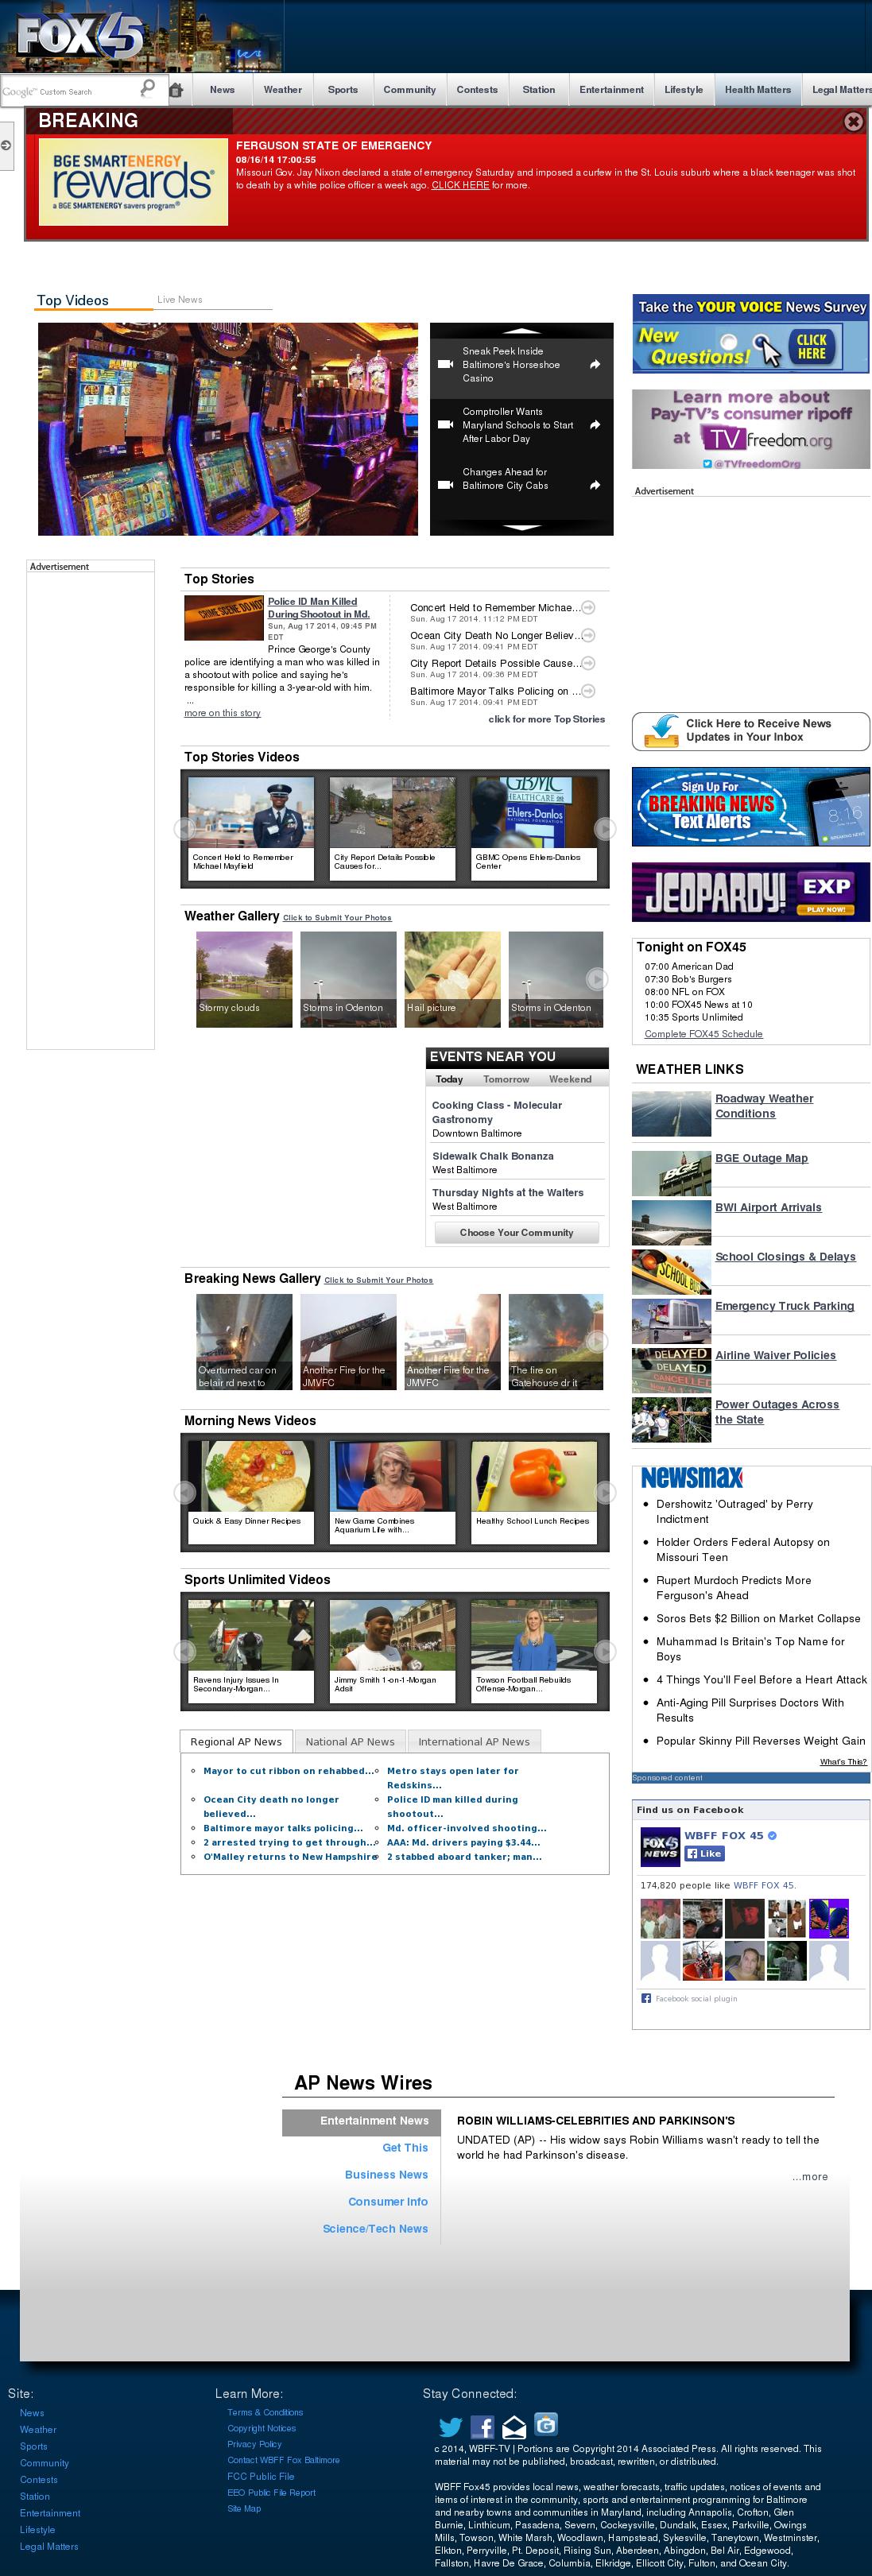 WBFF Fox45 Competitors, Revenue and Employees - Owler Company Profile